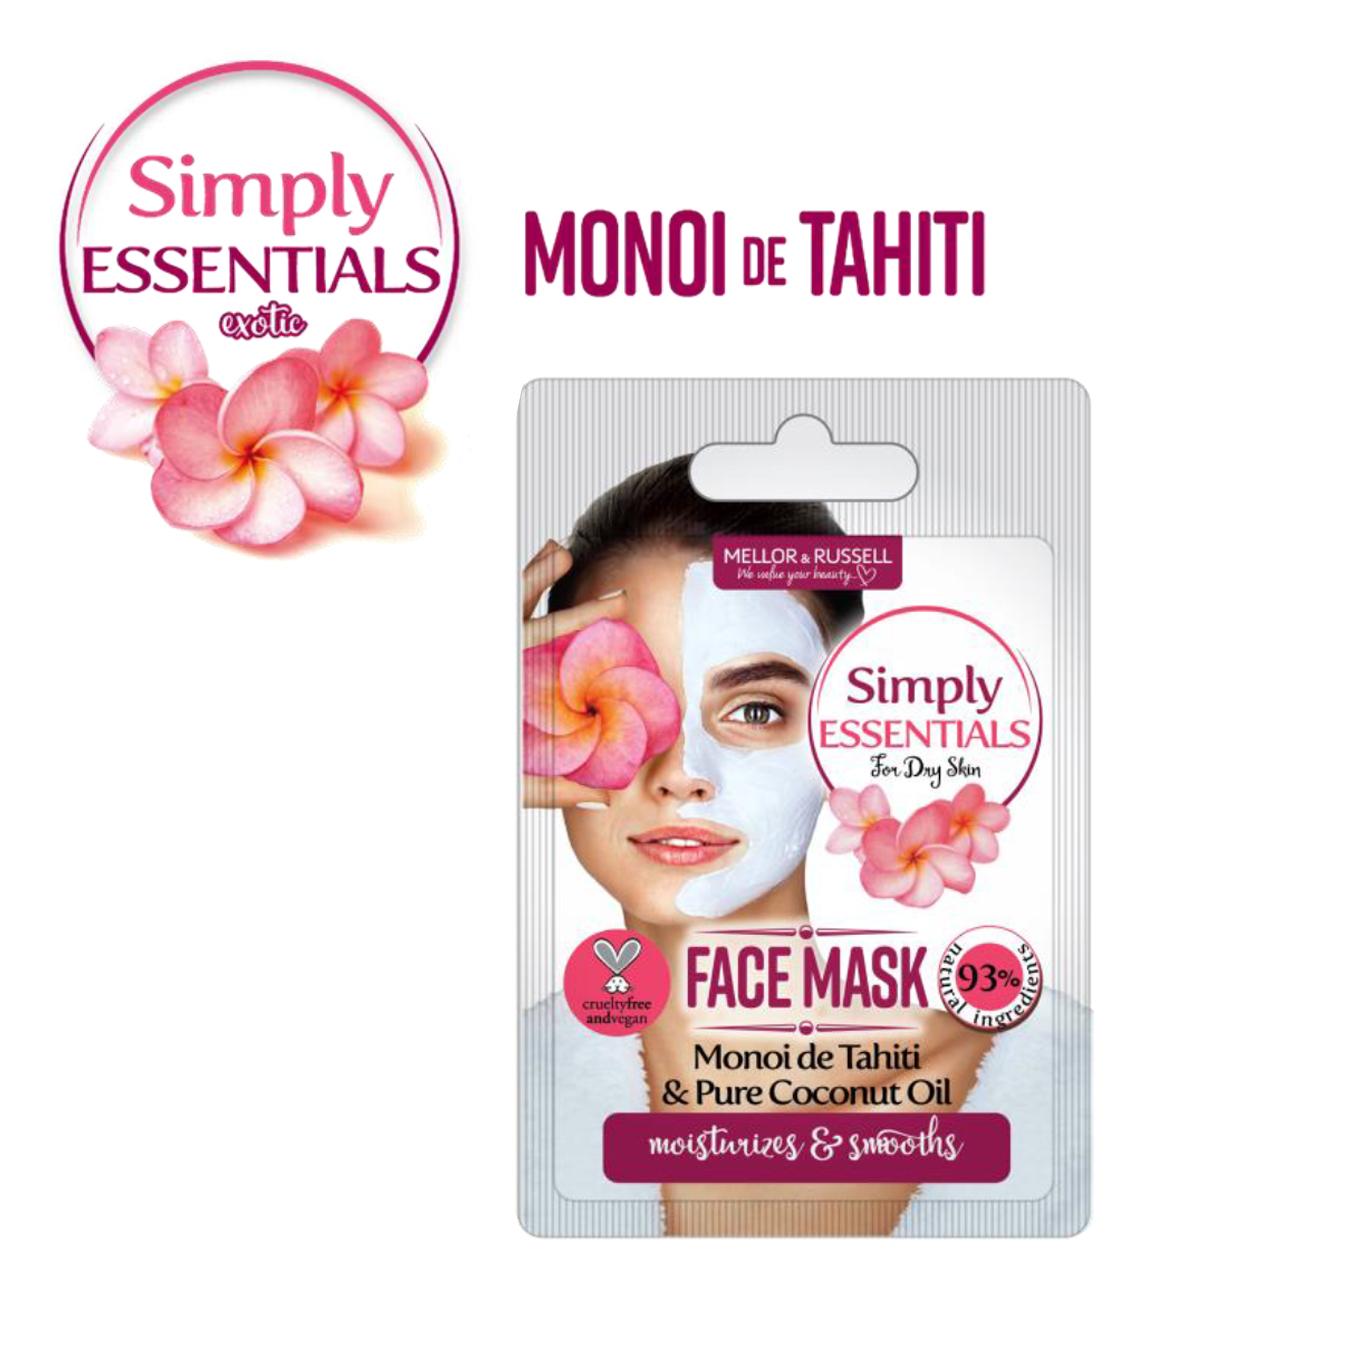 Simply Essentials Monoi de Tahiti Маска для лица с маслом Моной де Таити, 7 мл, саше